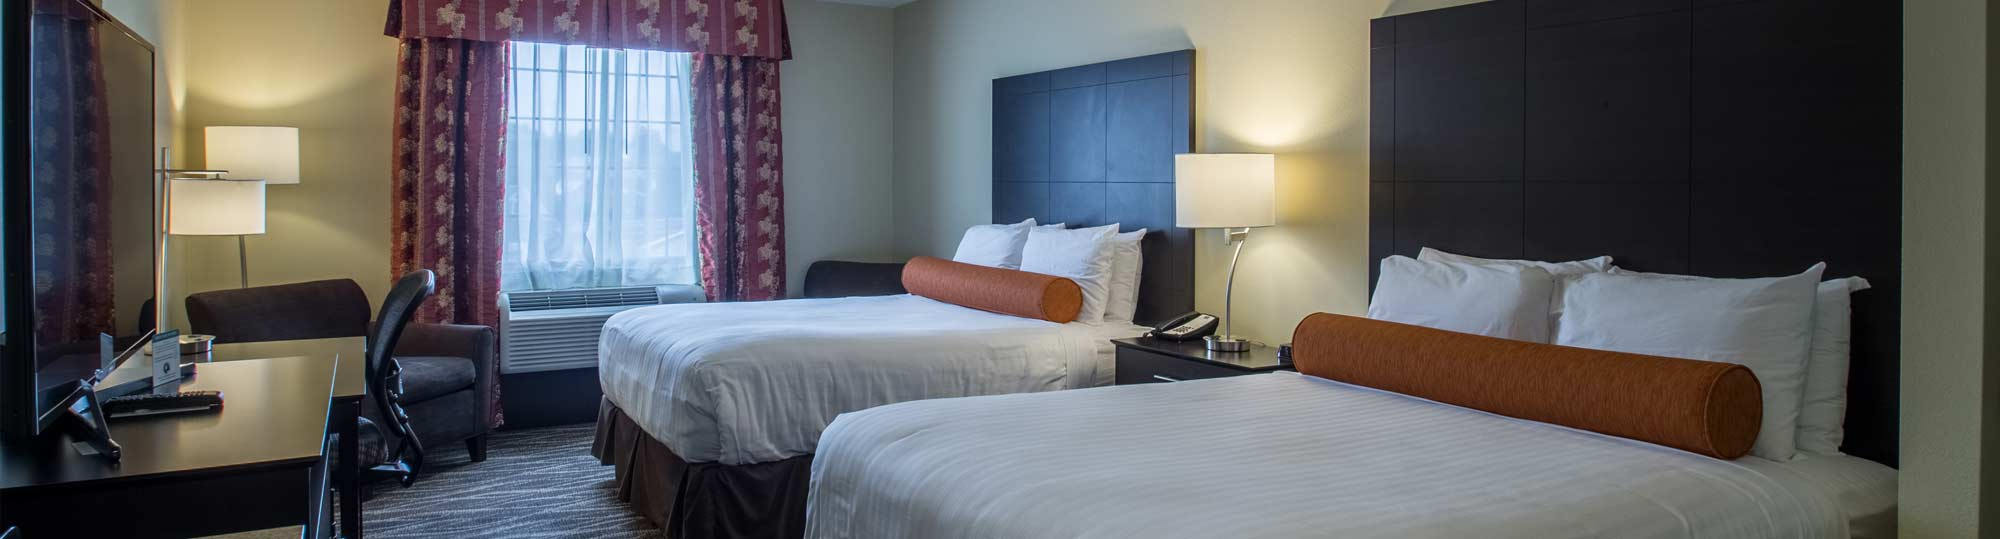 Cobblestone Inn and Suites St. Marys